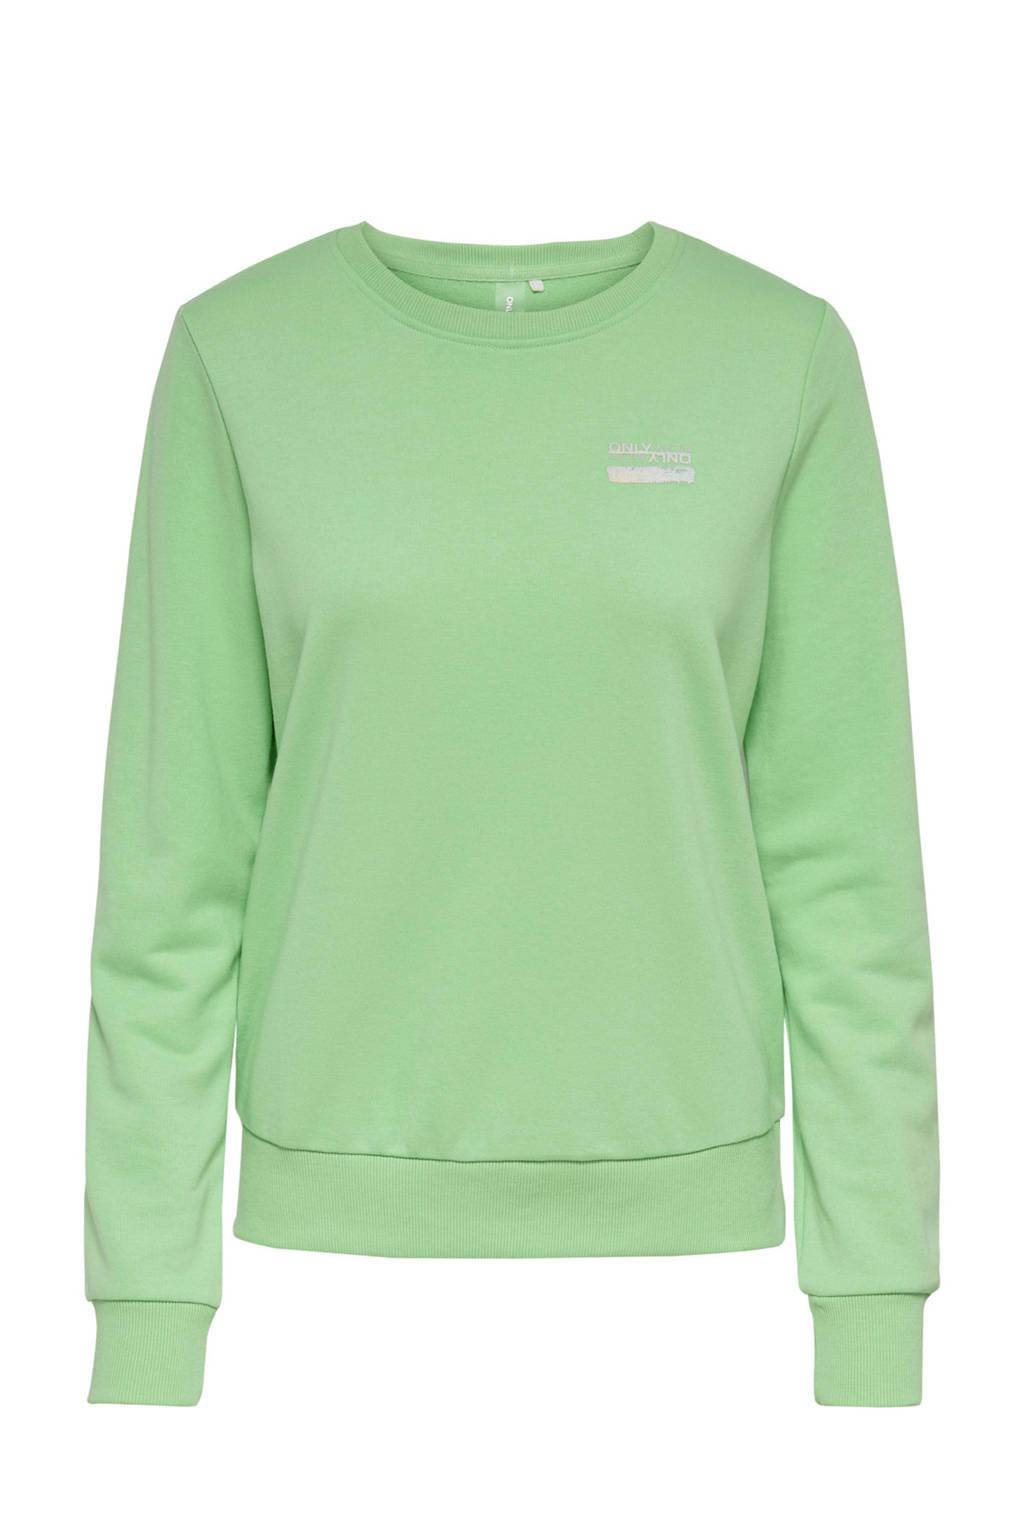 ONLY PLAY sportsweater limegroen, Limegroen